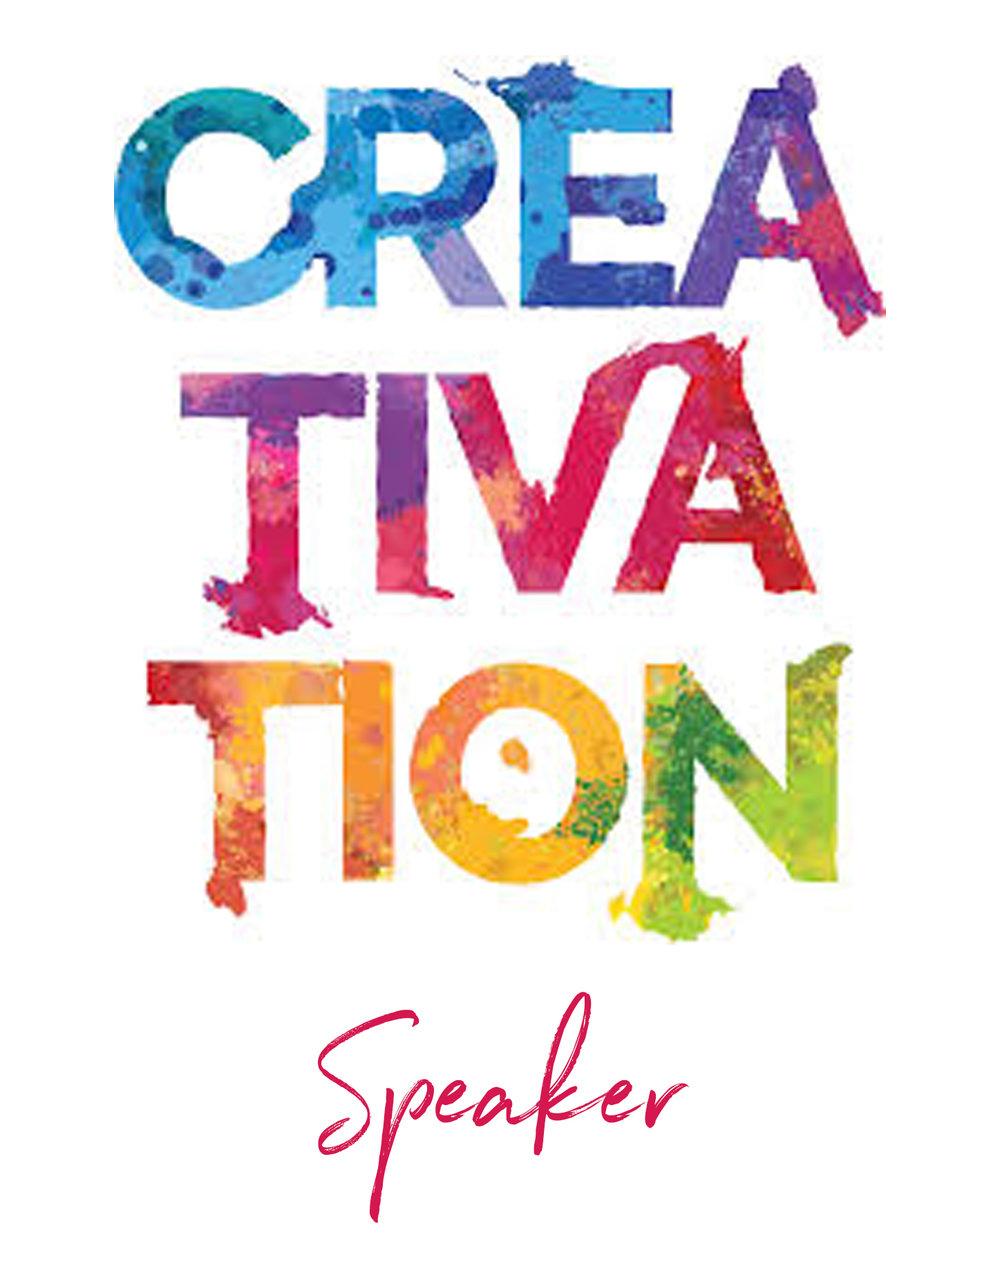 creativation paige poppe artist speaker.jpg